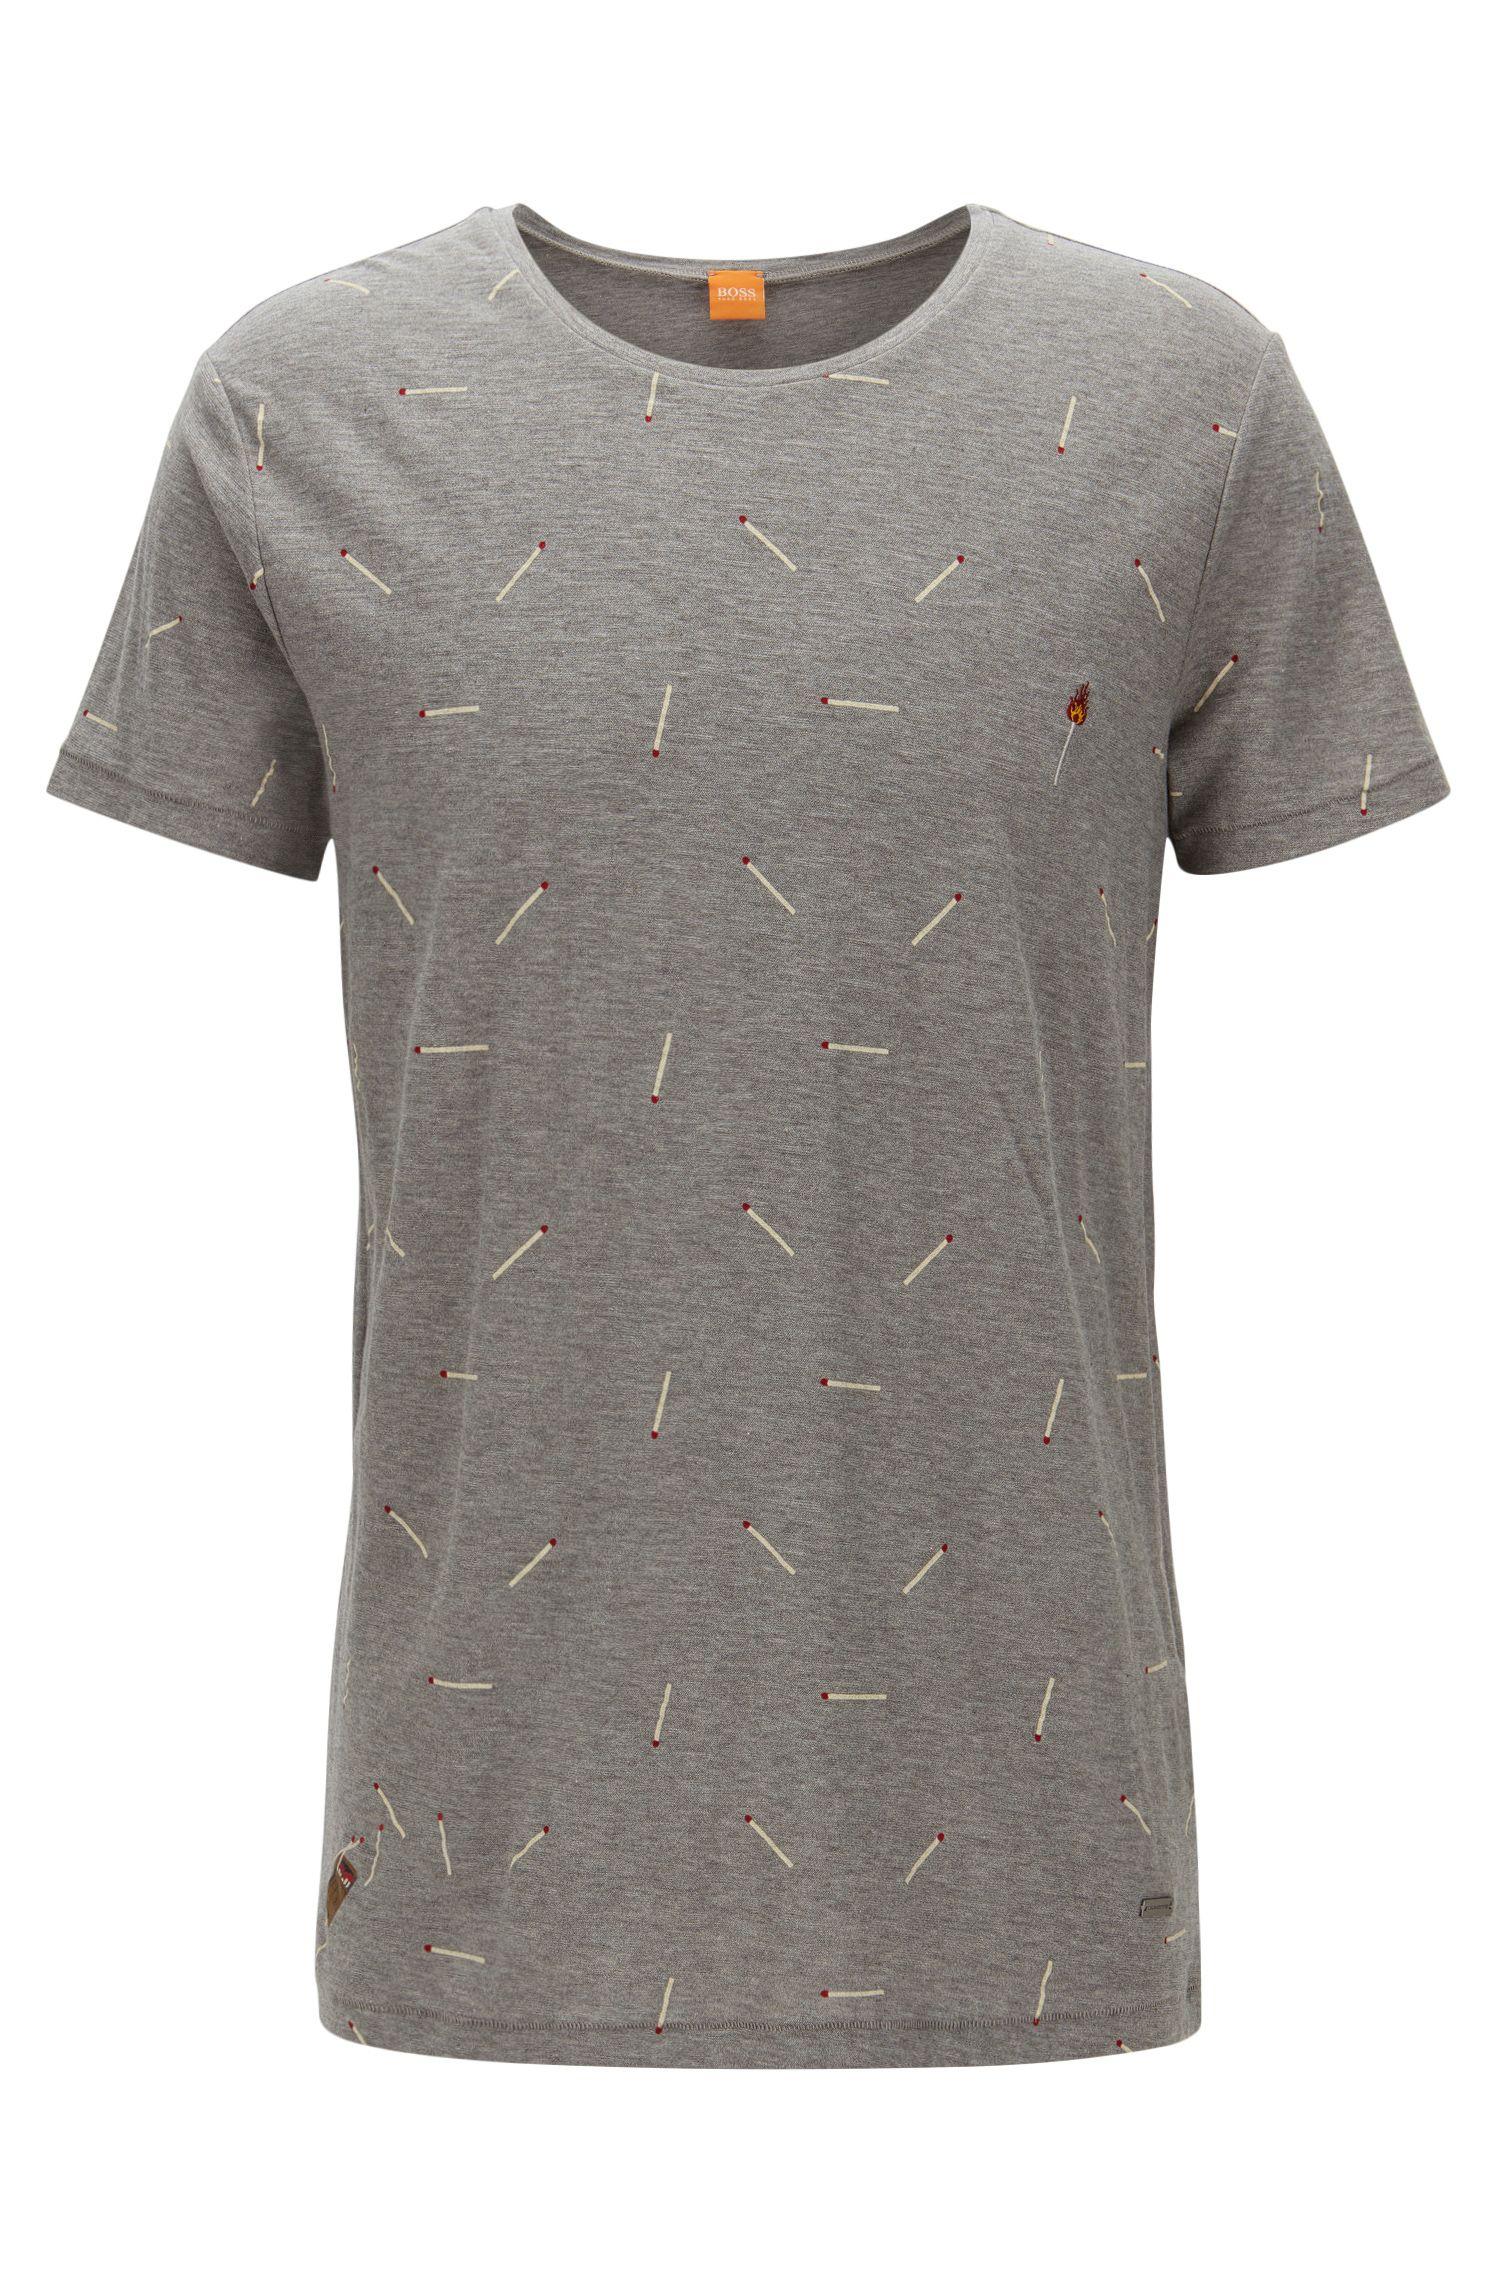 T-shirt relaxed fit in jersey slub yarn